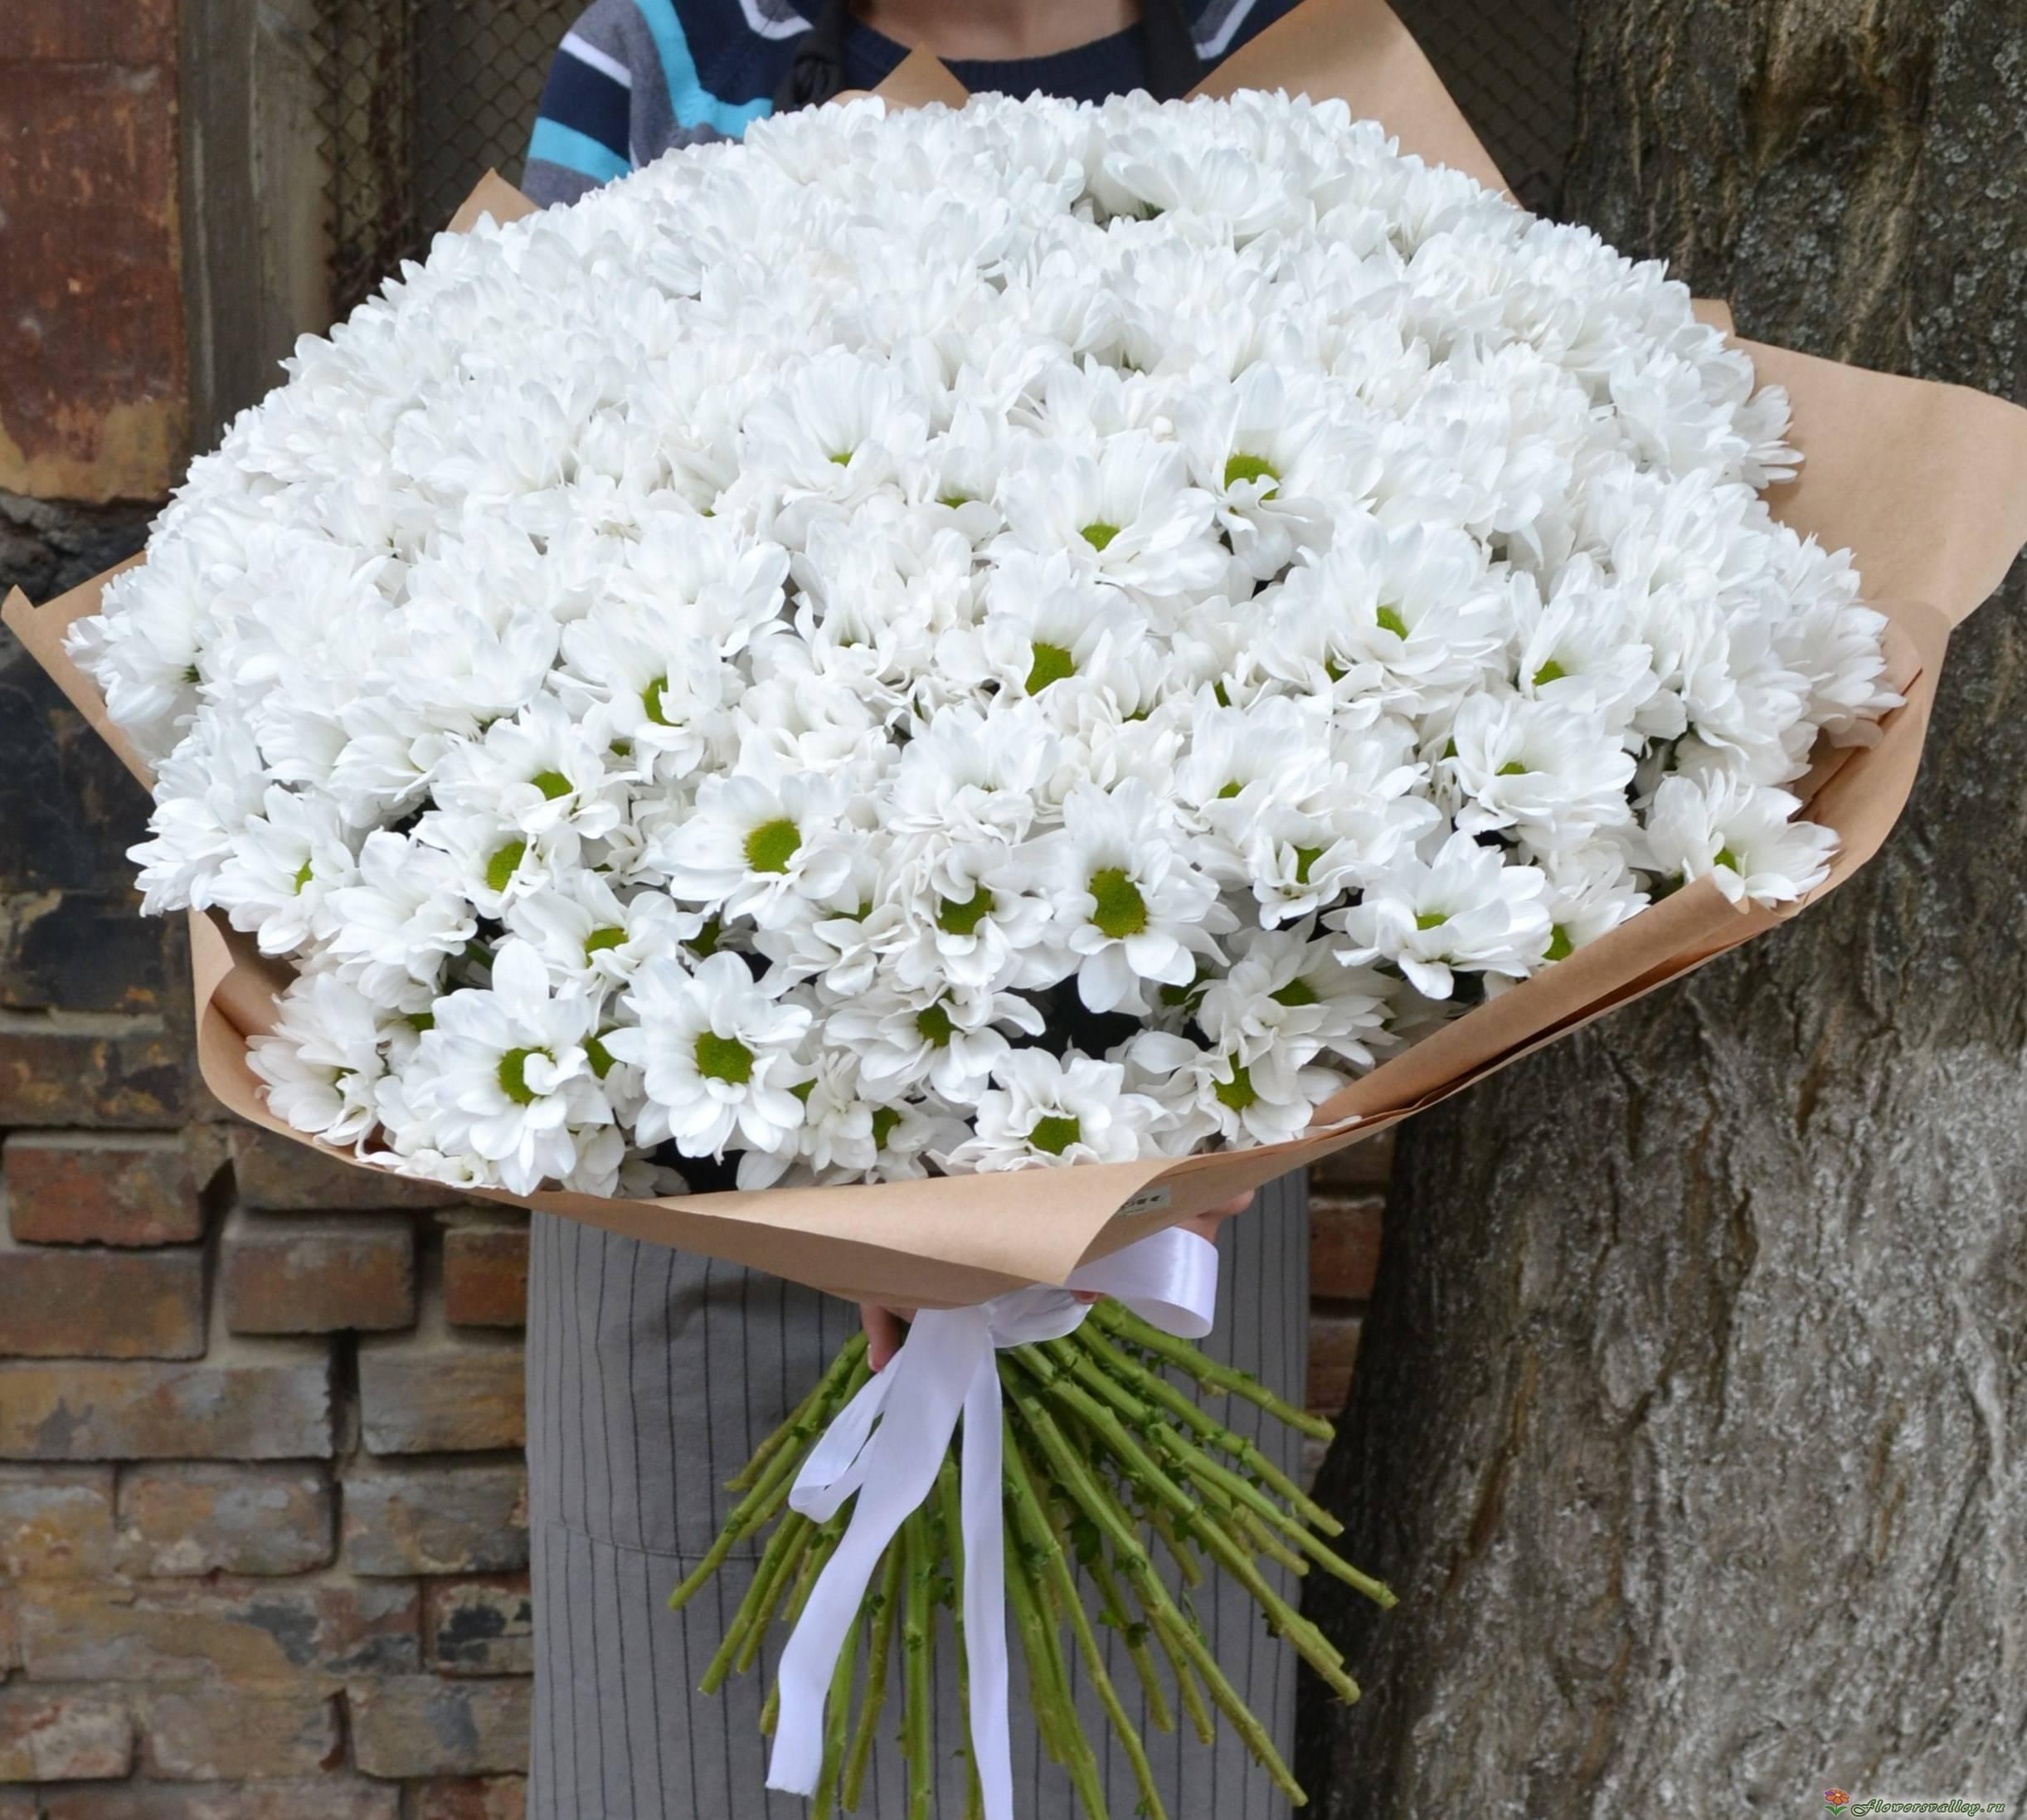 Как посадить хризантему бакарди в саду: правила ухода за кустовым цветком